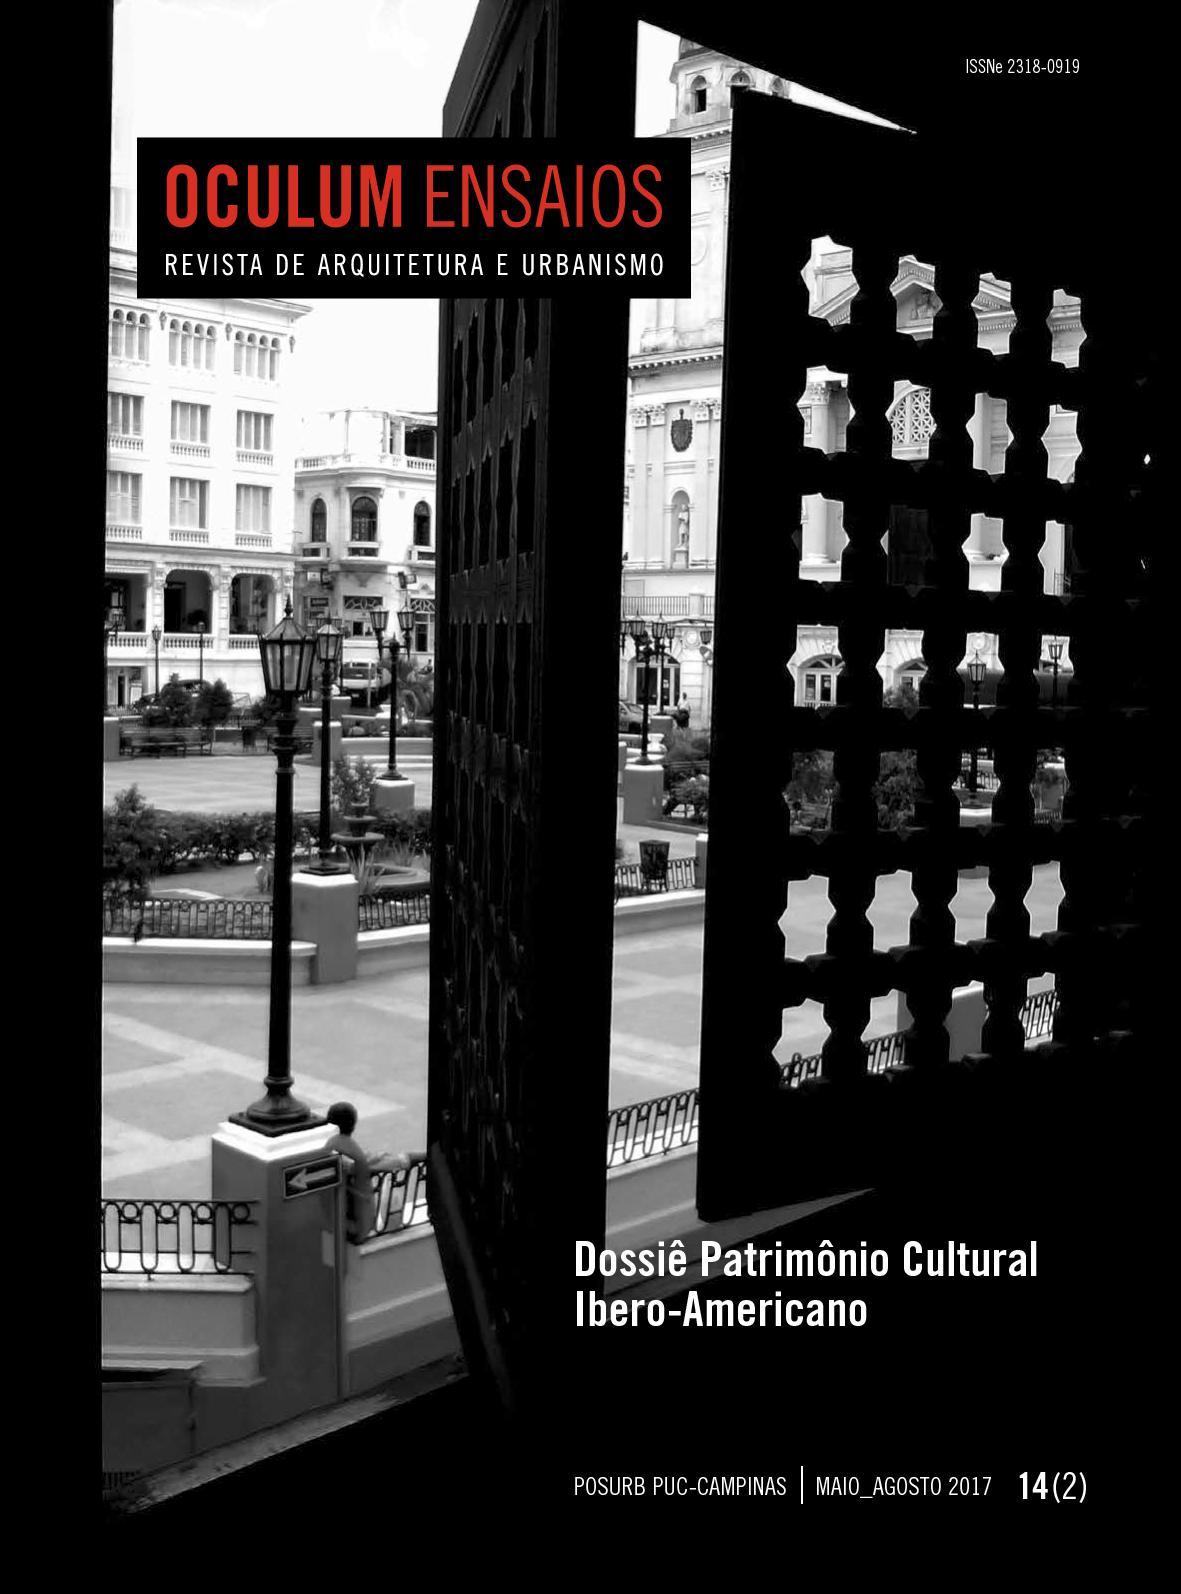 Calaméo - Oculum N 14 - Dossiê Patrimônio Cultural Ibero-Americano -  Arquitetura e Urbanismo 3f3460bdf7